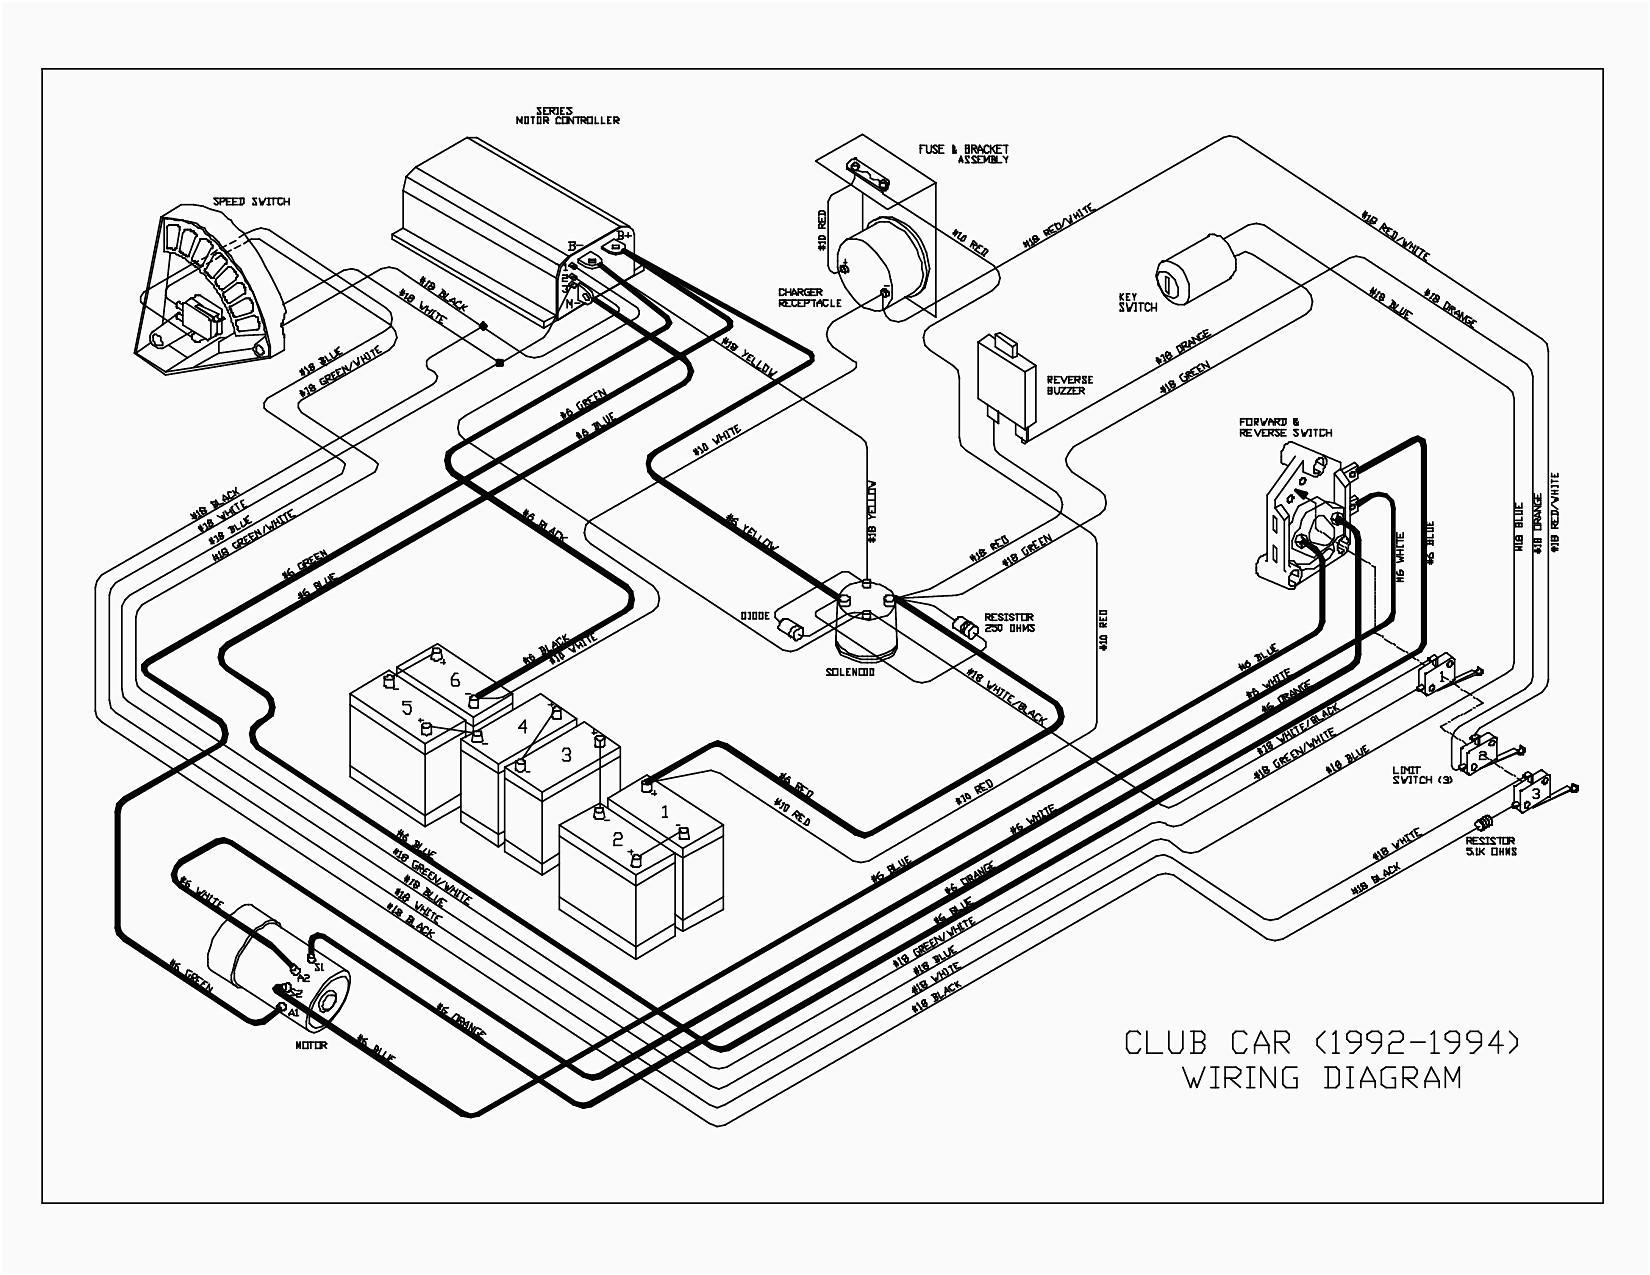 Club car ds parts diagram ingersoll rand club car wiring diagram in luxury parts 43 inside